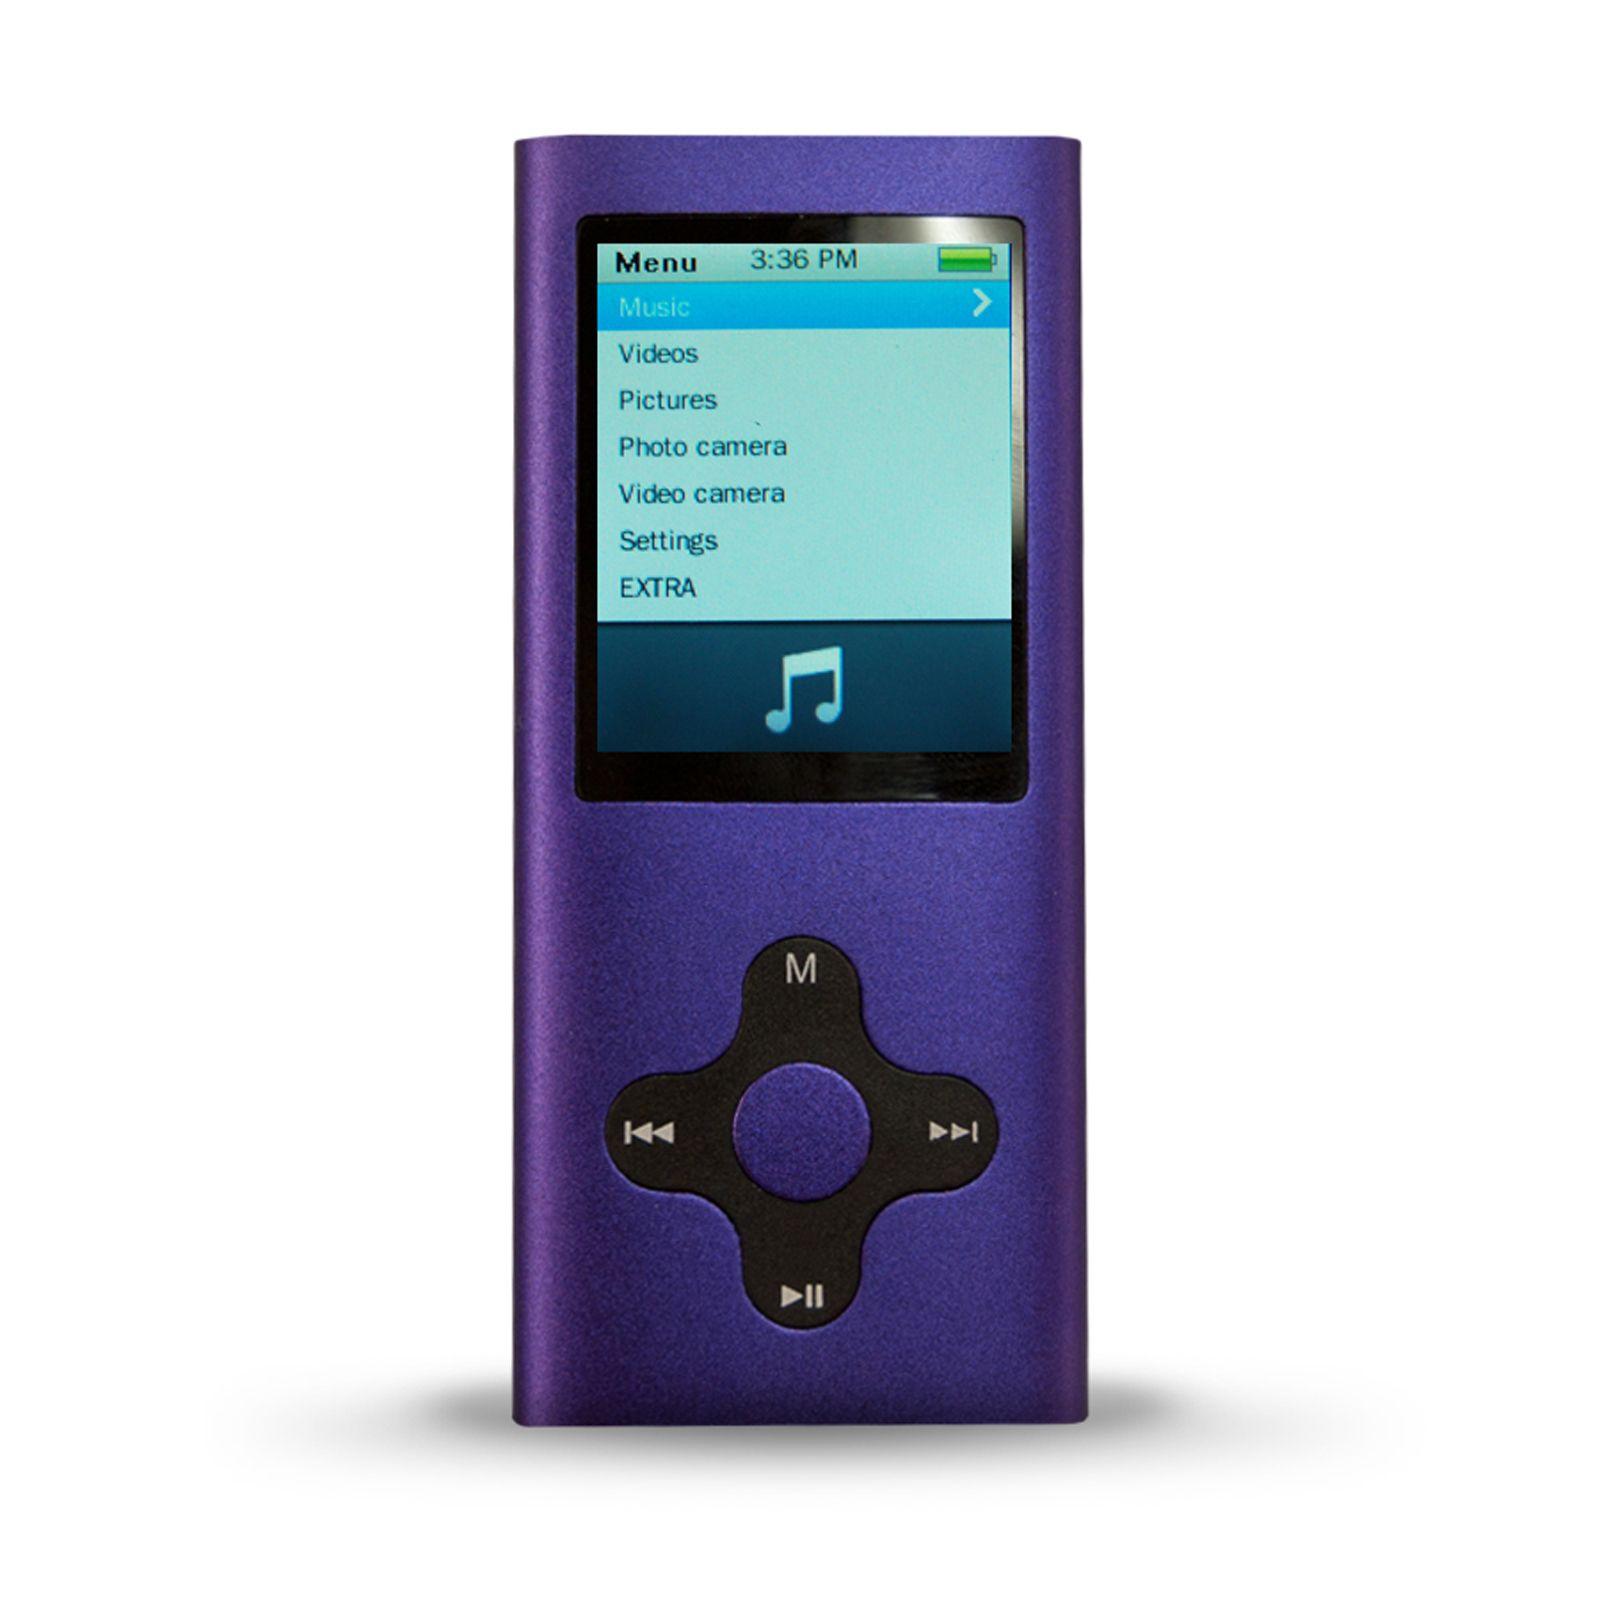 Mach Speed Technologies 4GB MP3 Player Purple TVs